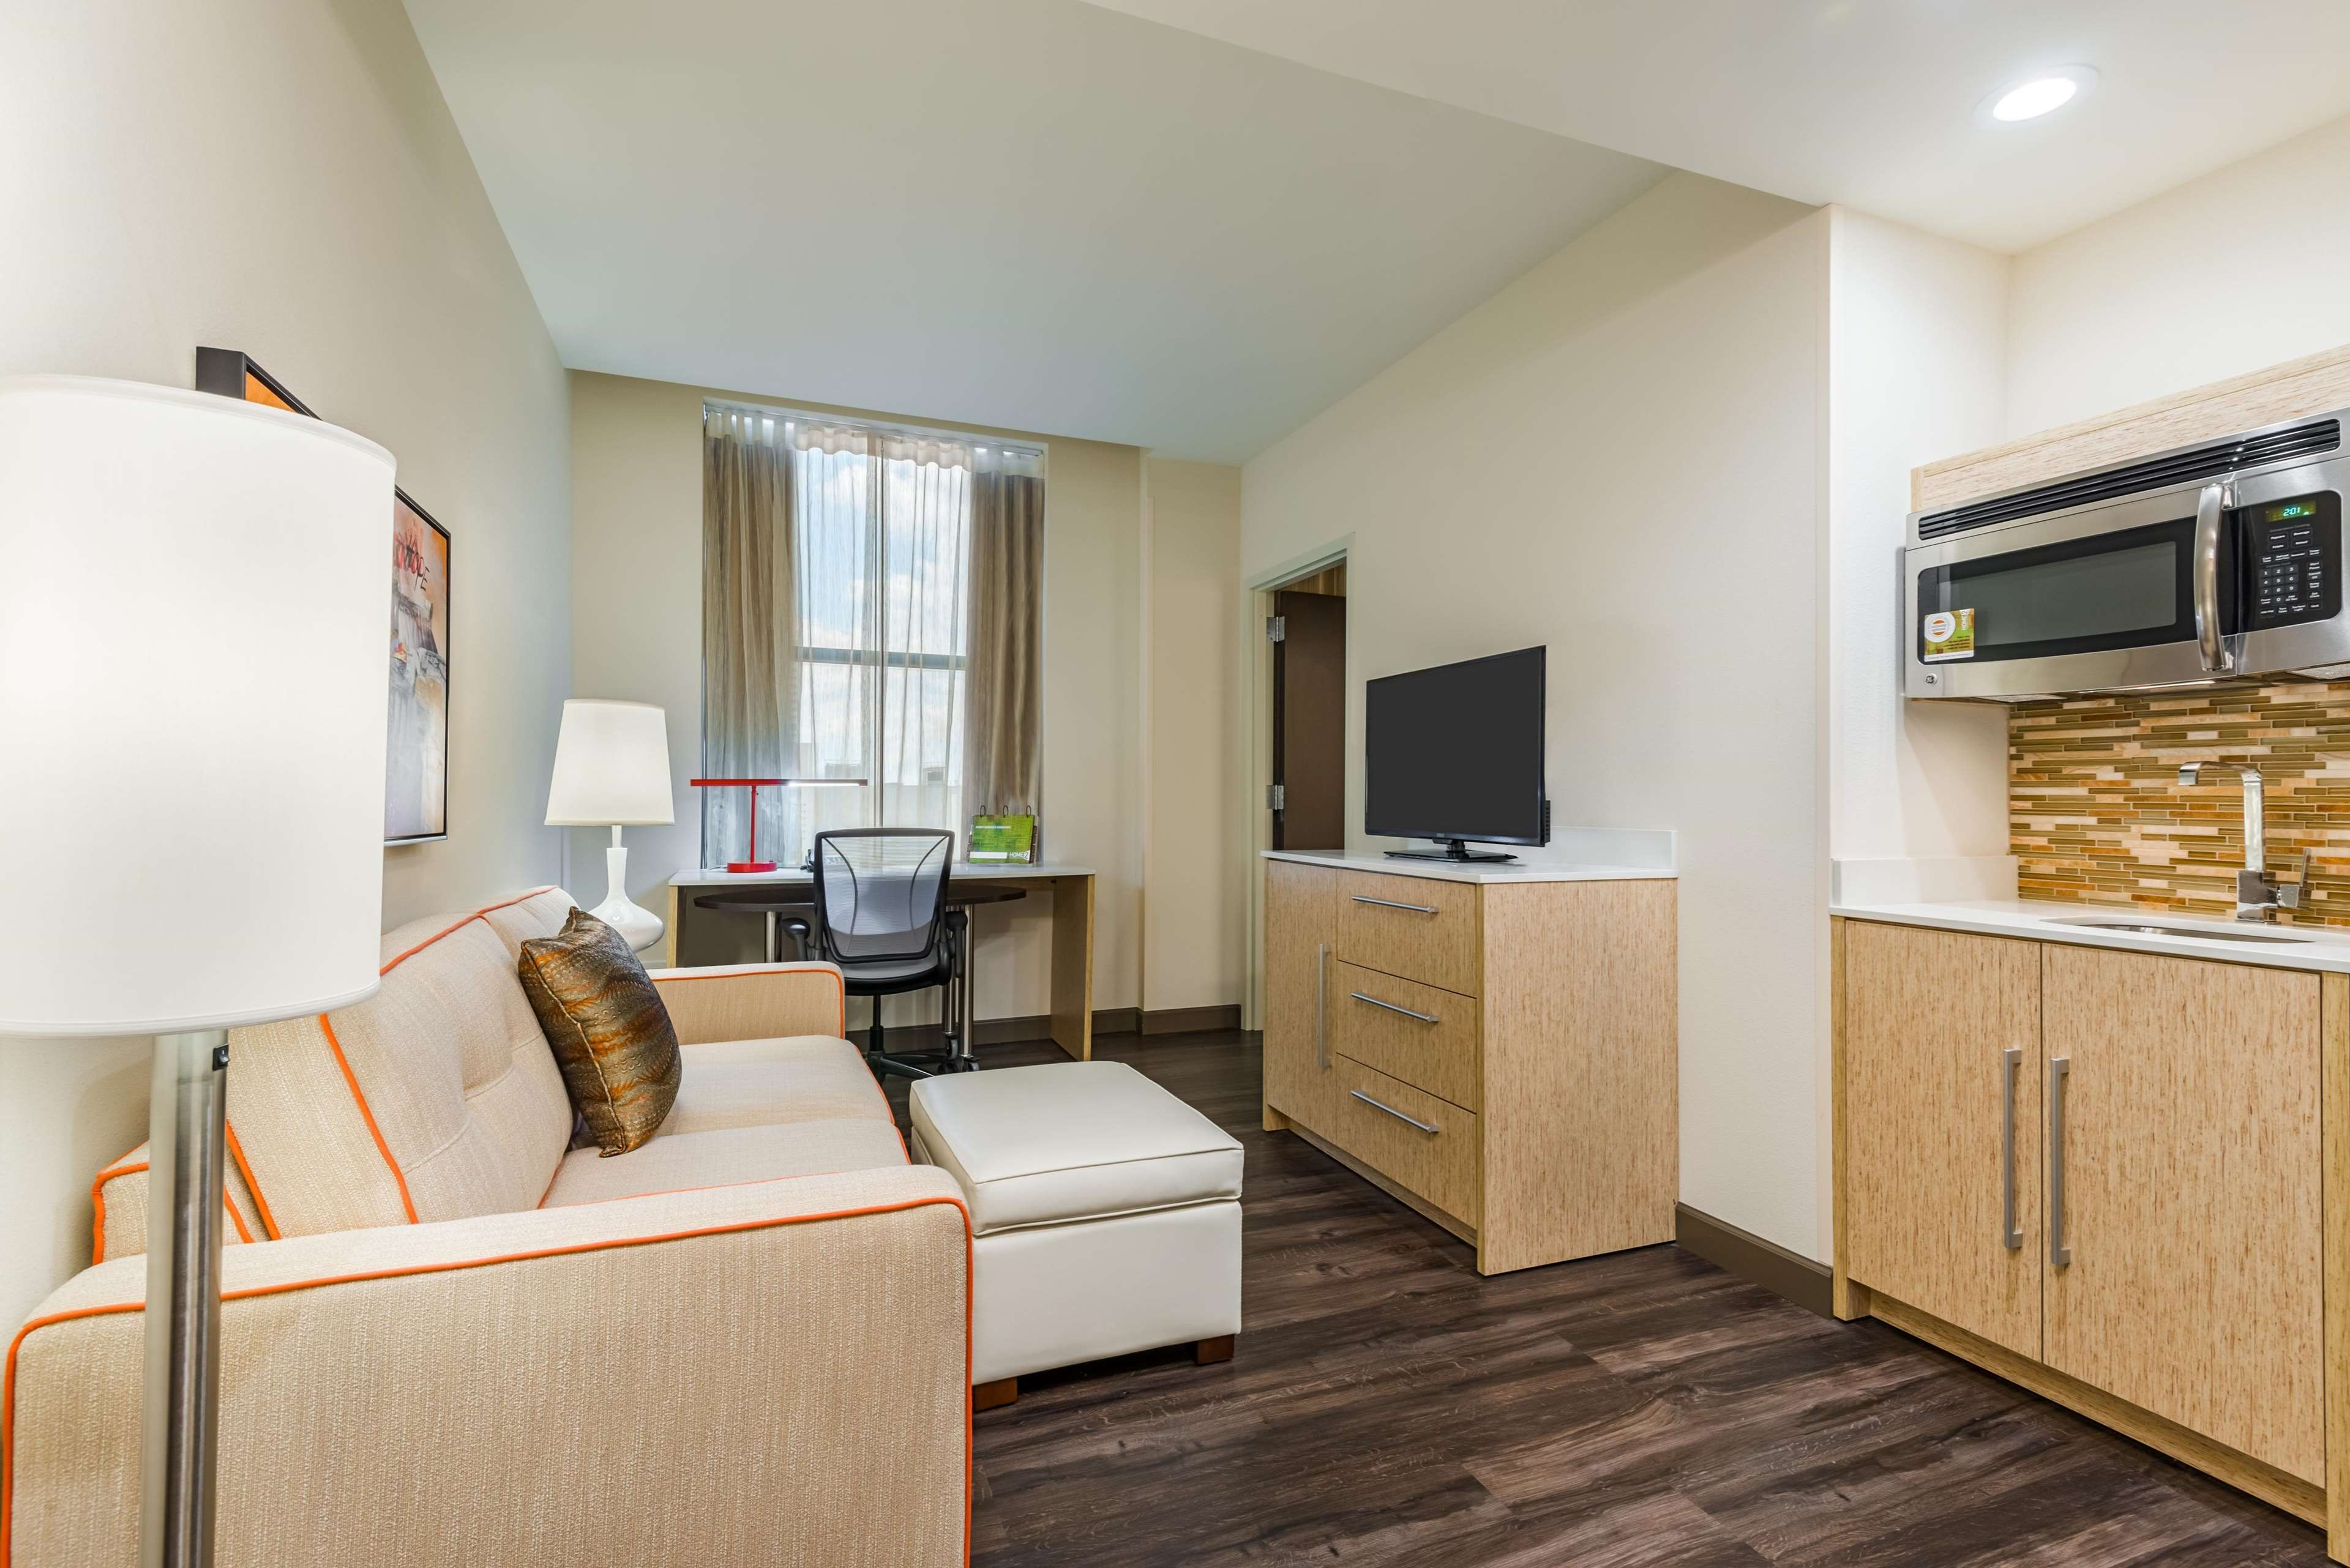 Home2 Suites by Hilton Atlanta Downtown image 24